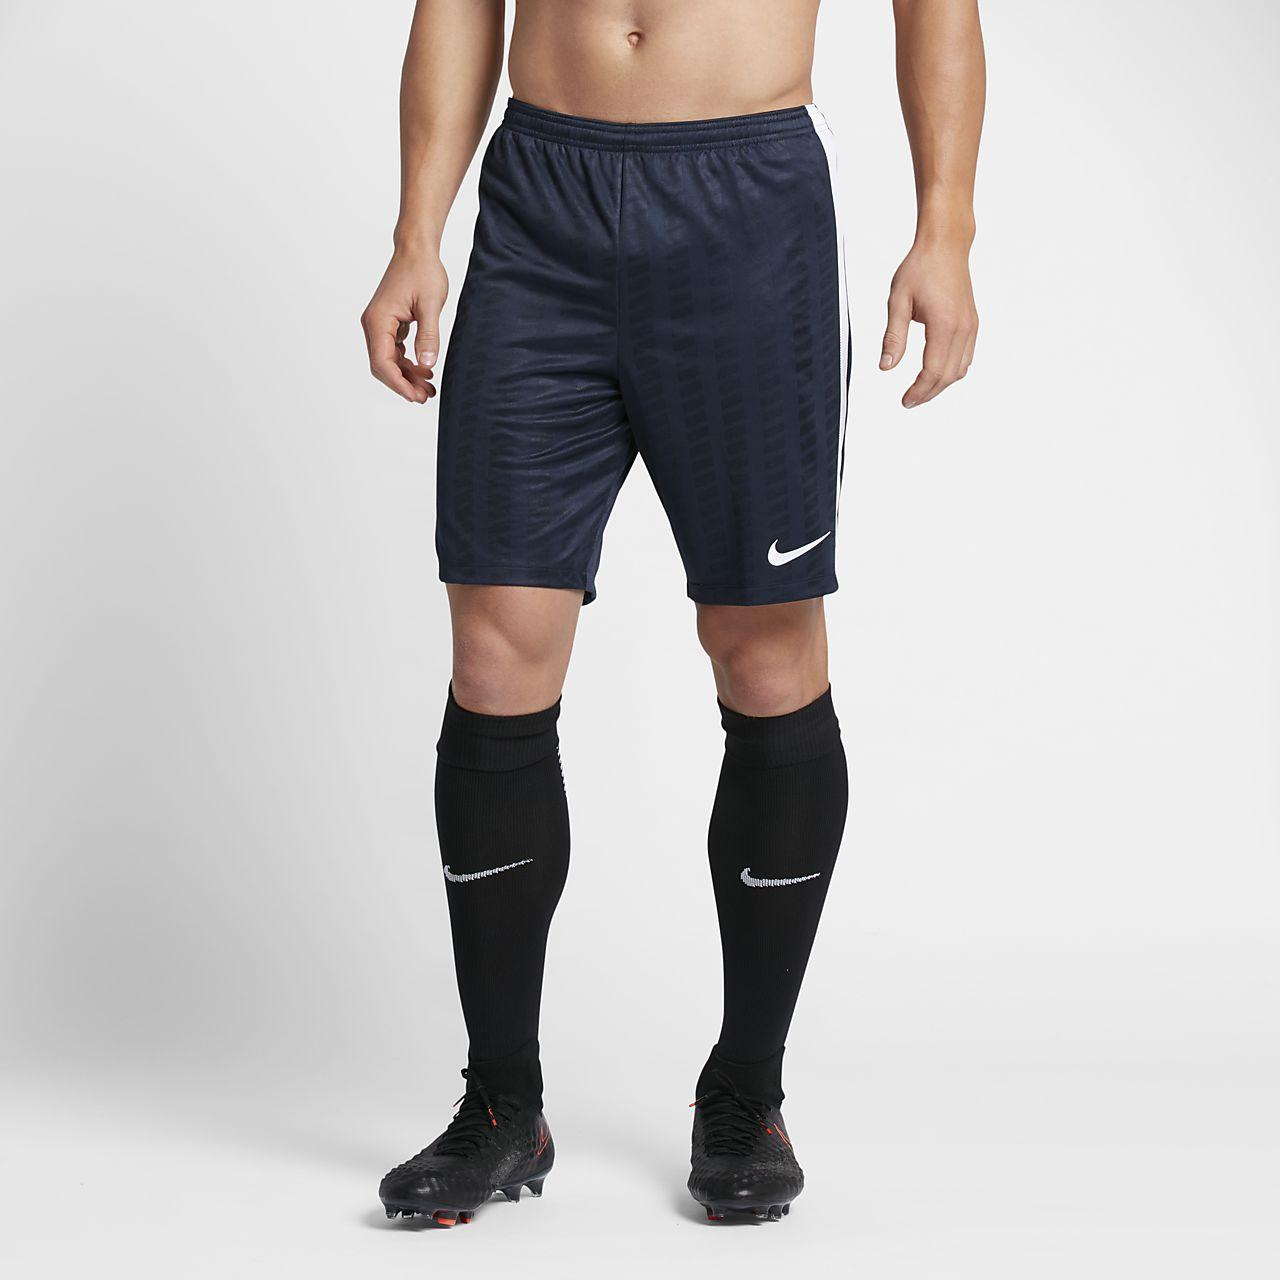 Short de football Nike Academy pour Homme